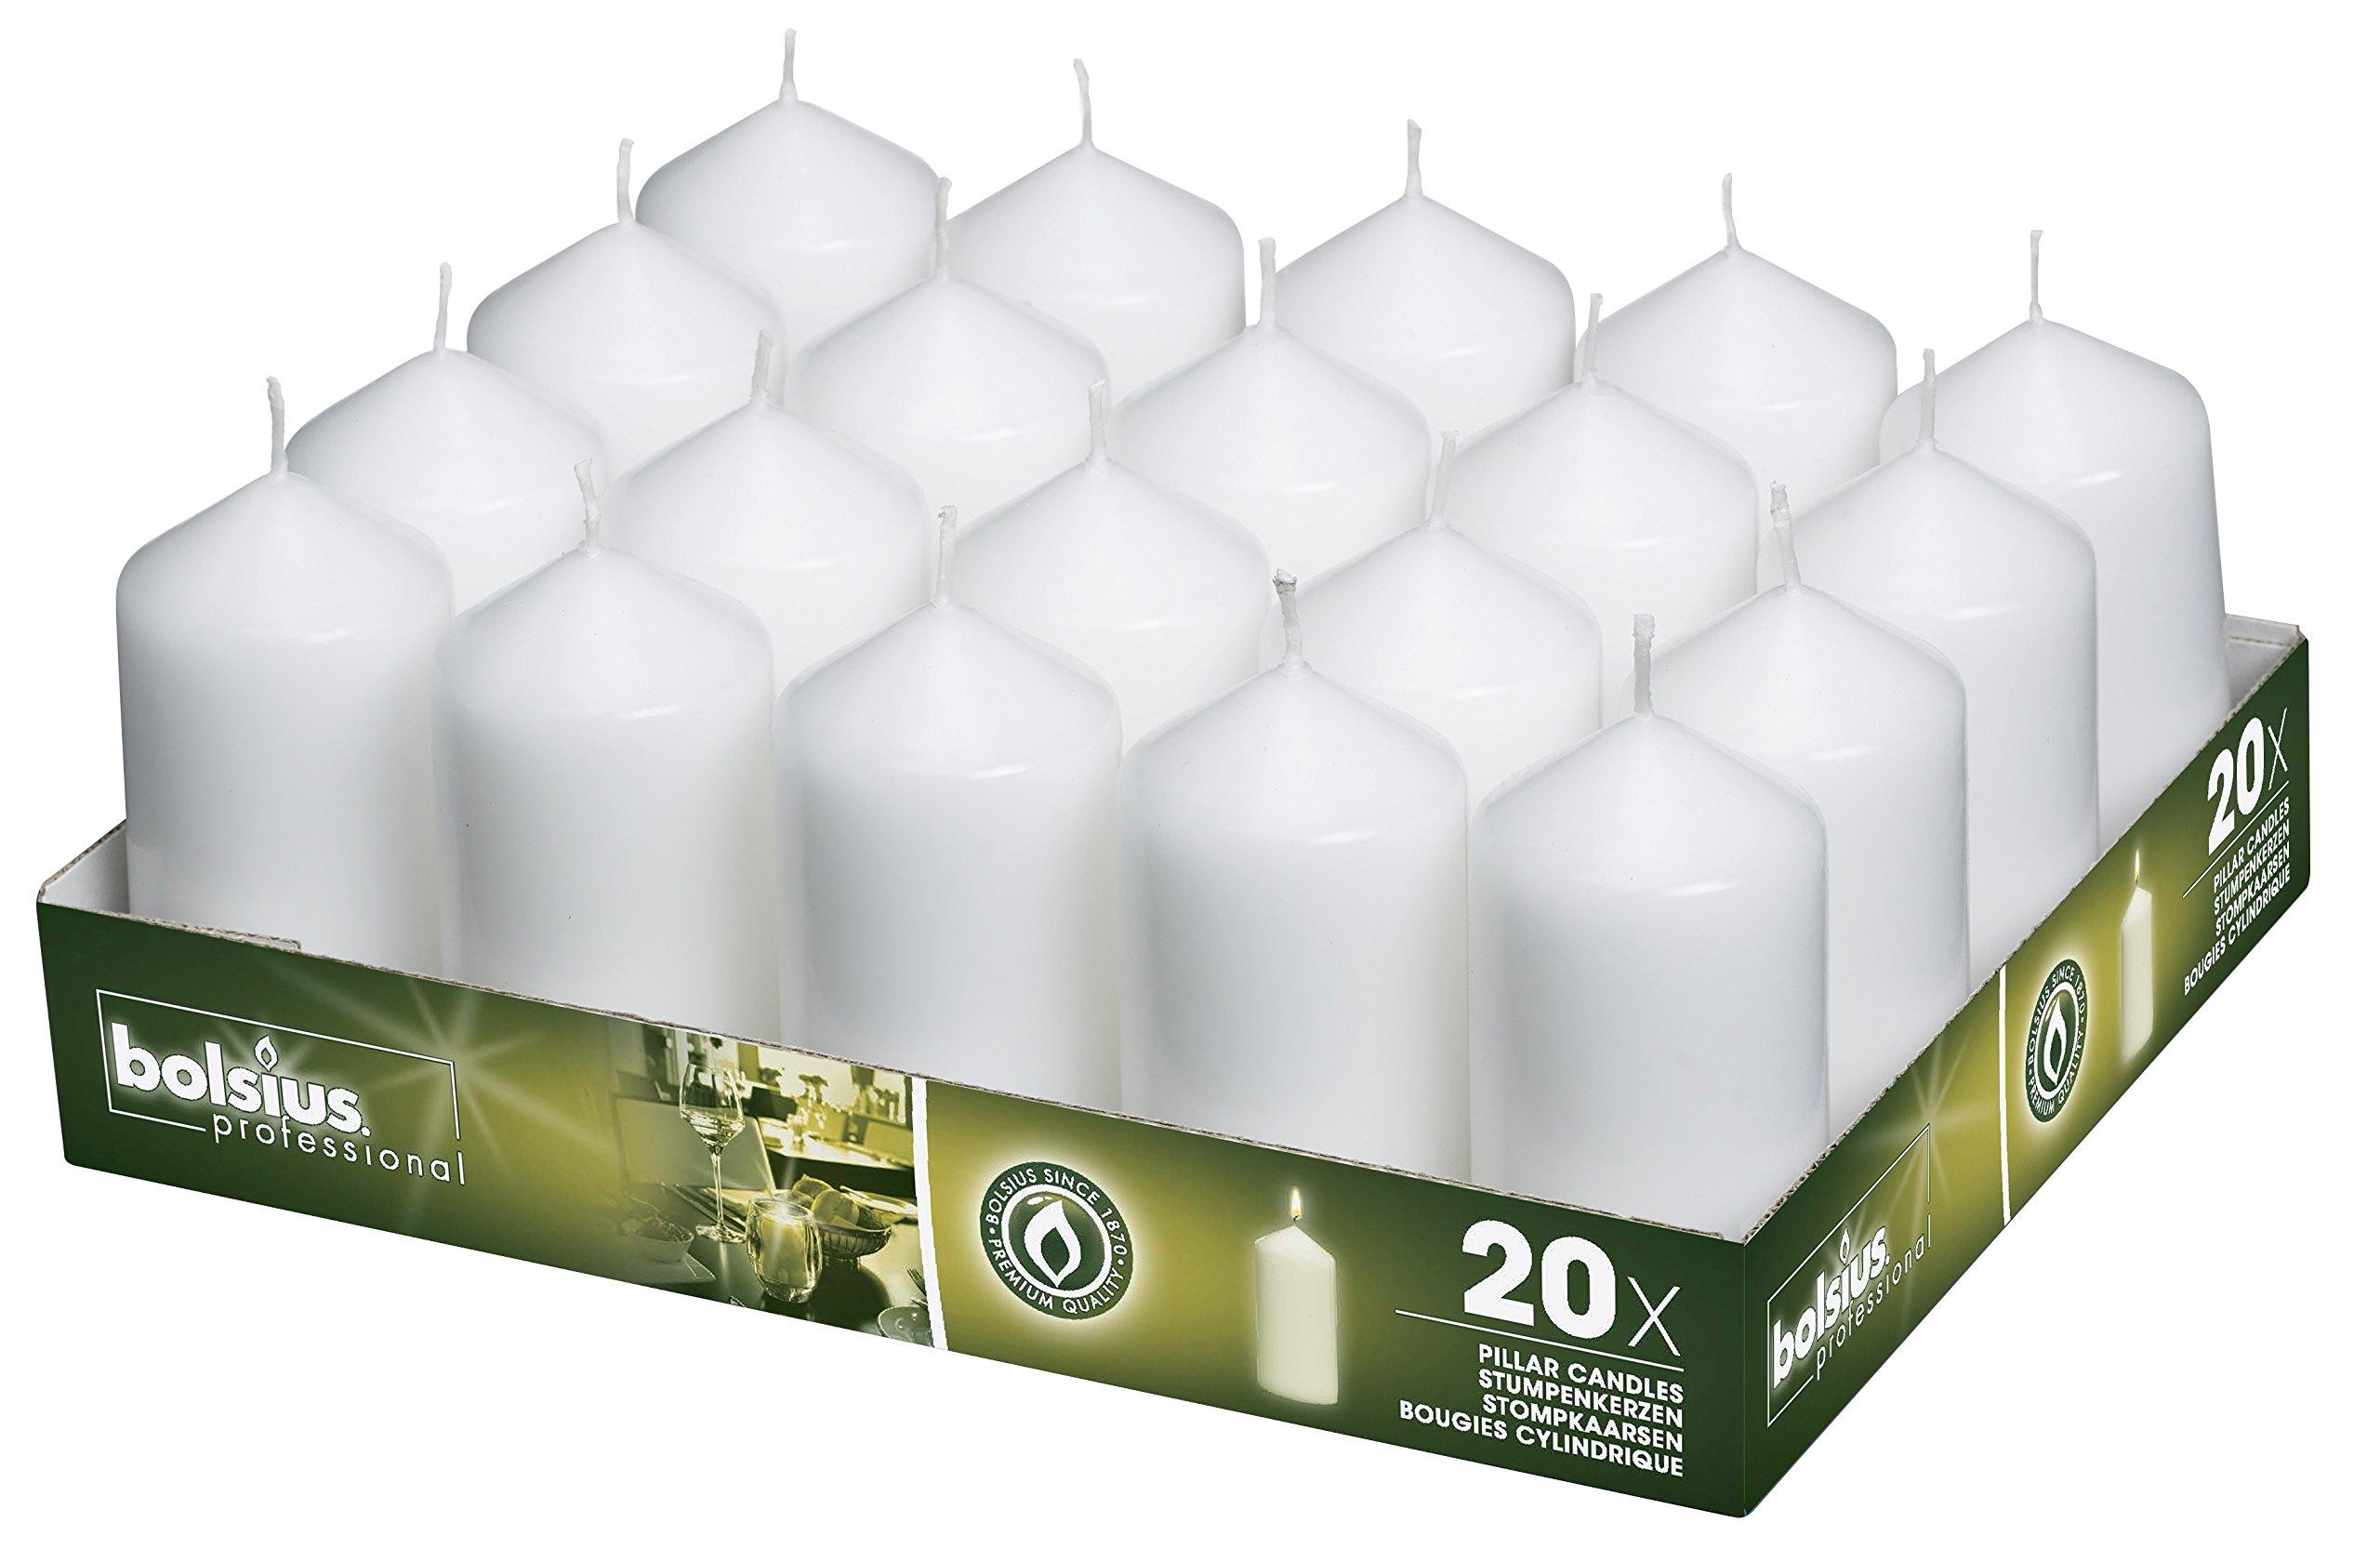 BOLSIUS Tray White Pillar Candles